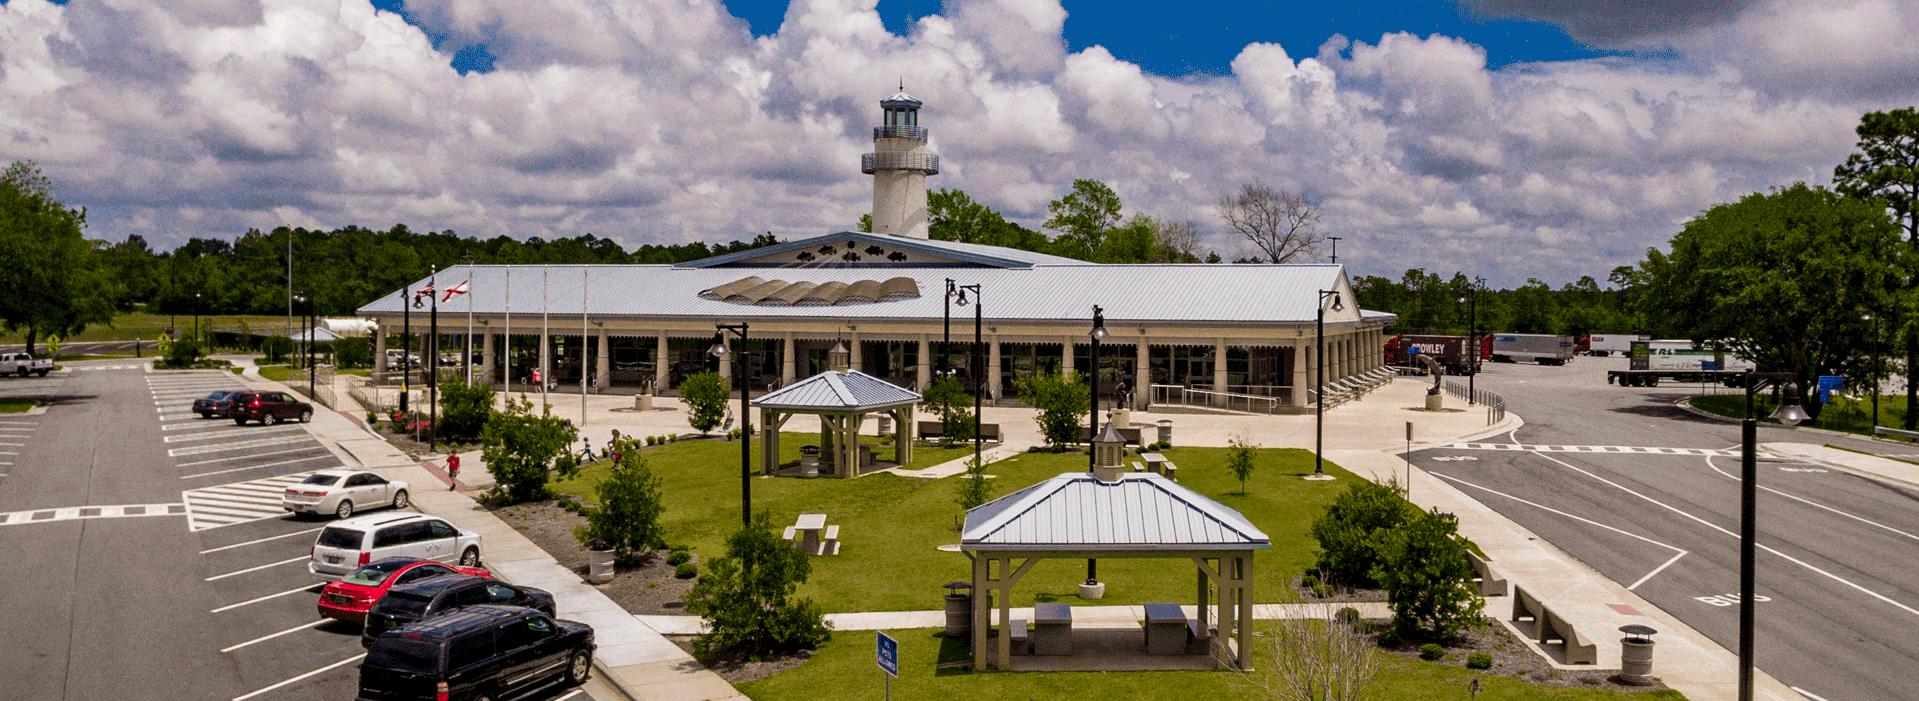 An Alabama Welcome Center